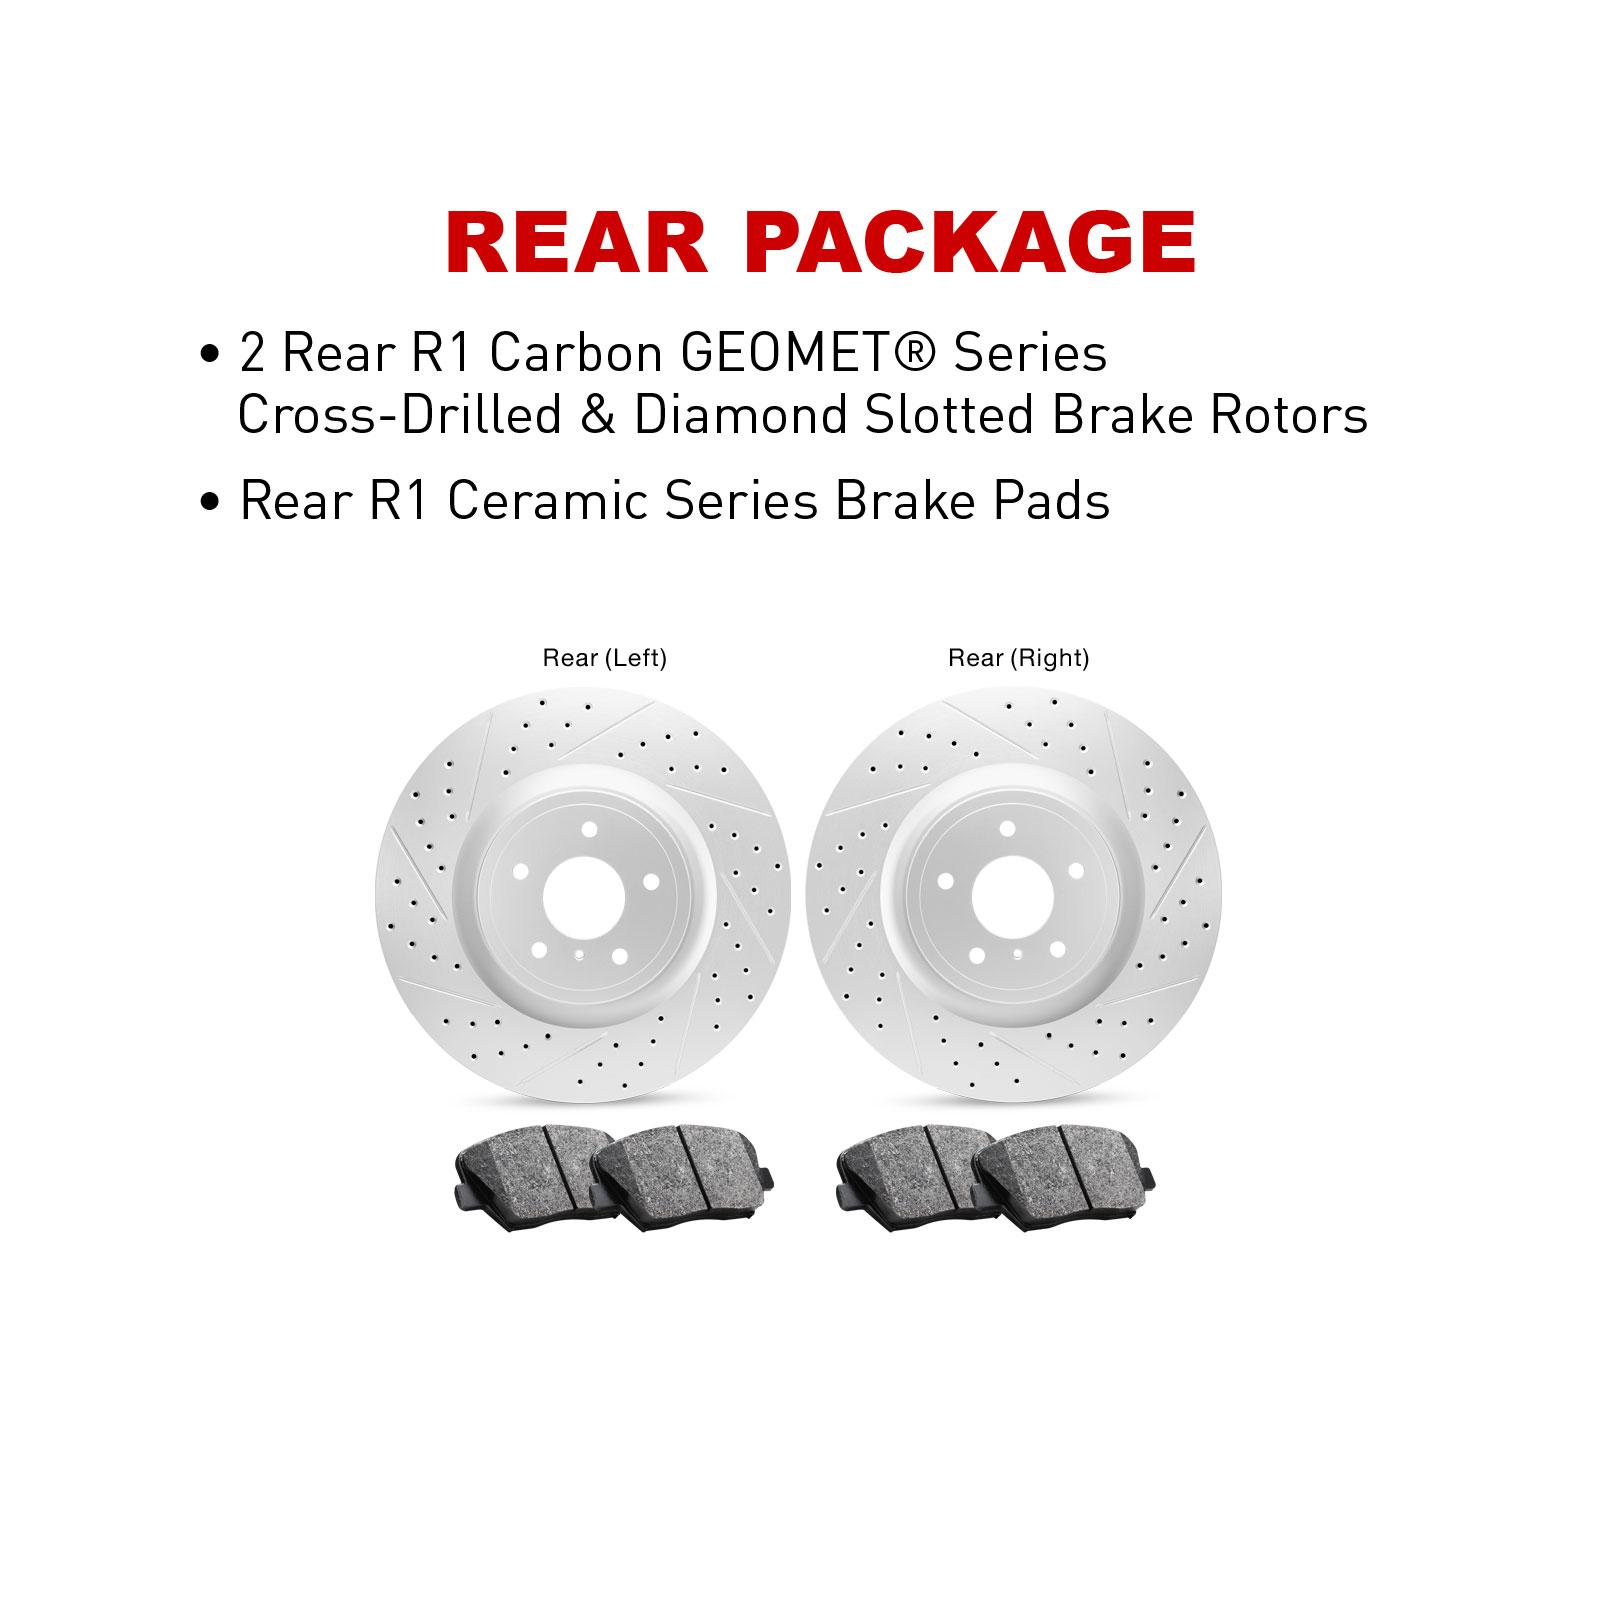 Front Set R1 Carbon Geomet Drill//Slot Brake Rotors Ceramic Brake Pads